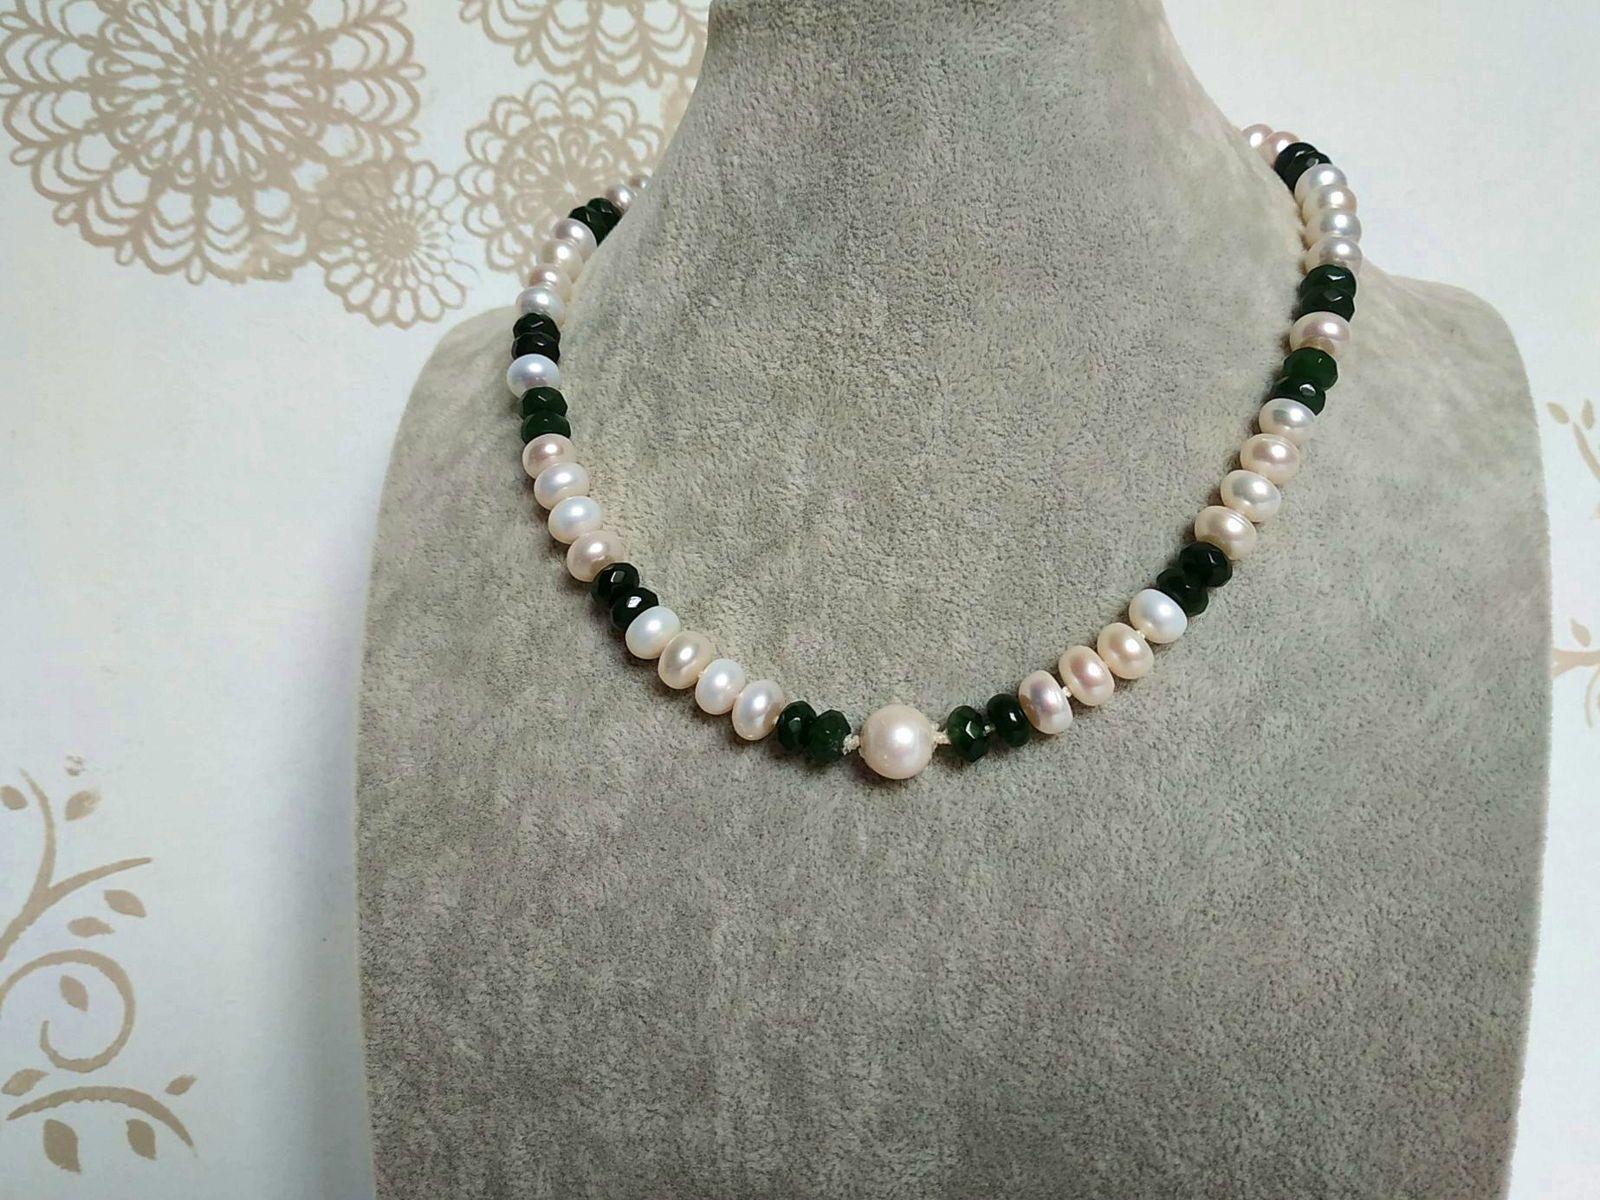 Collier de jade et perles d'eau de mer